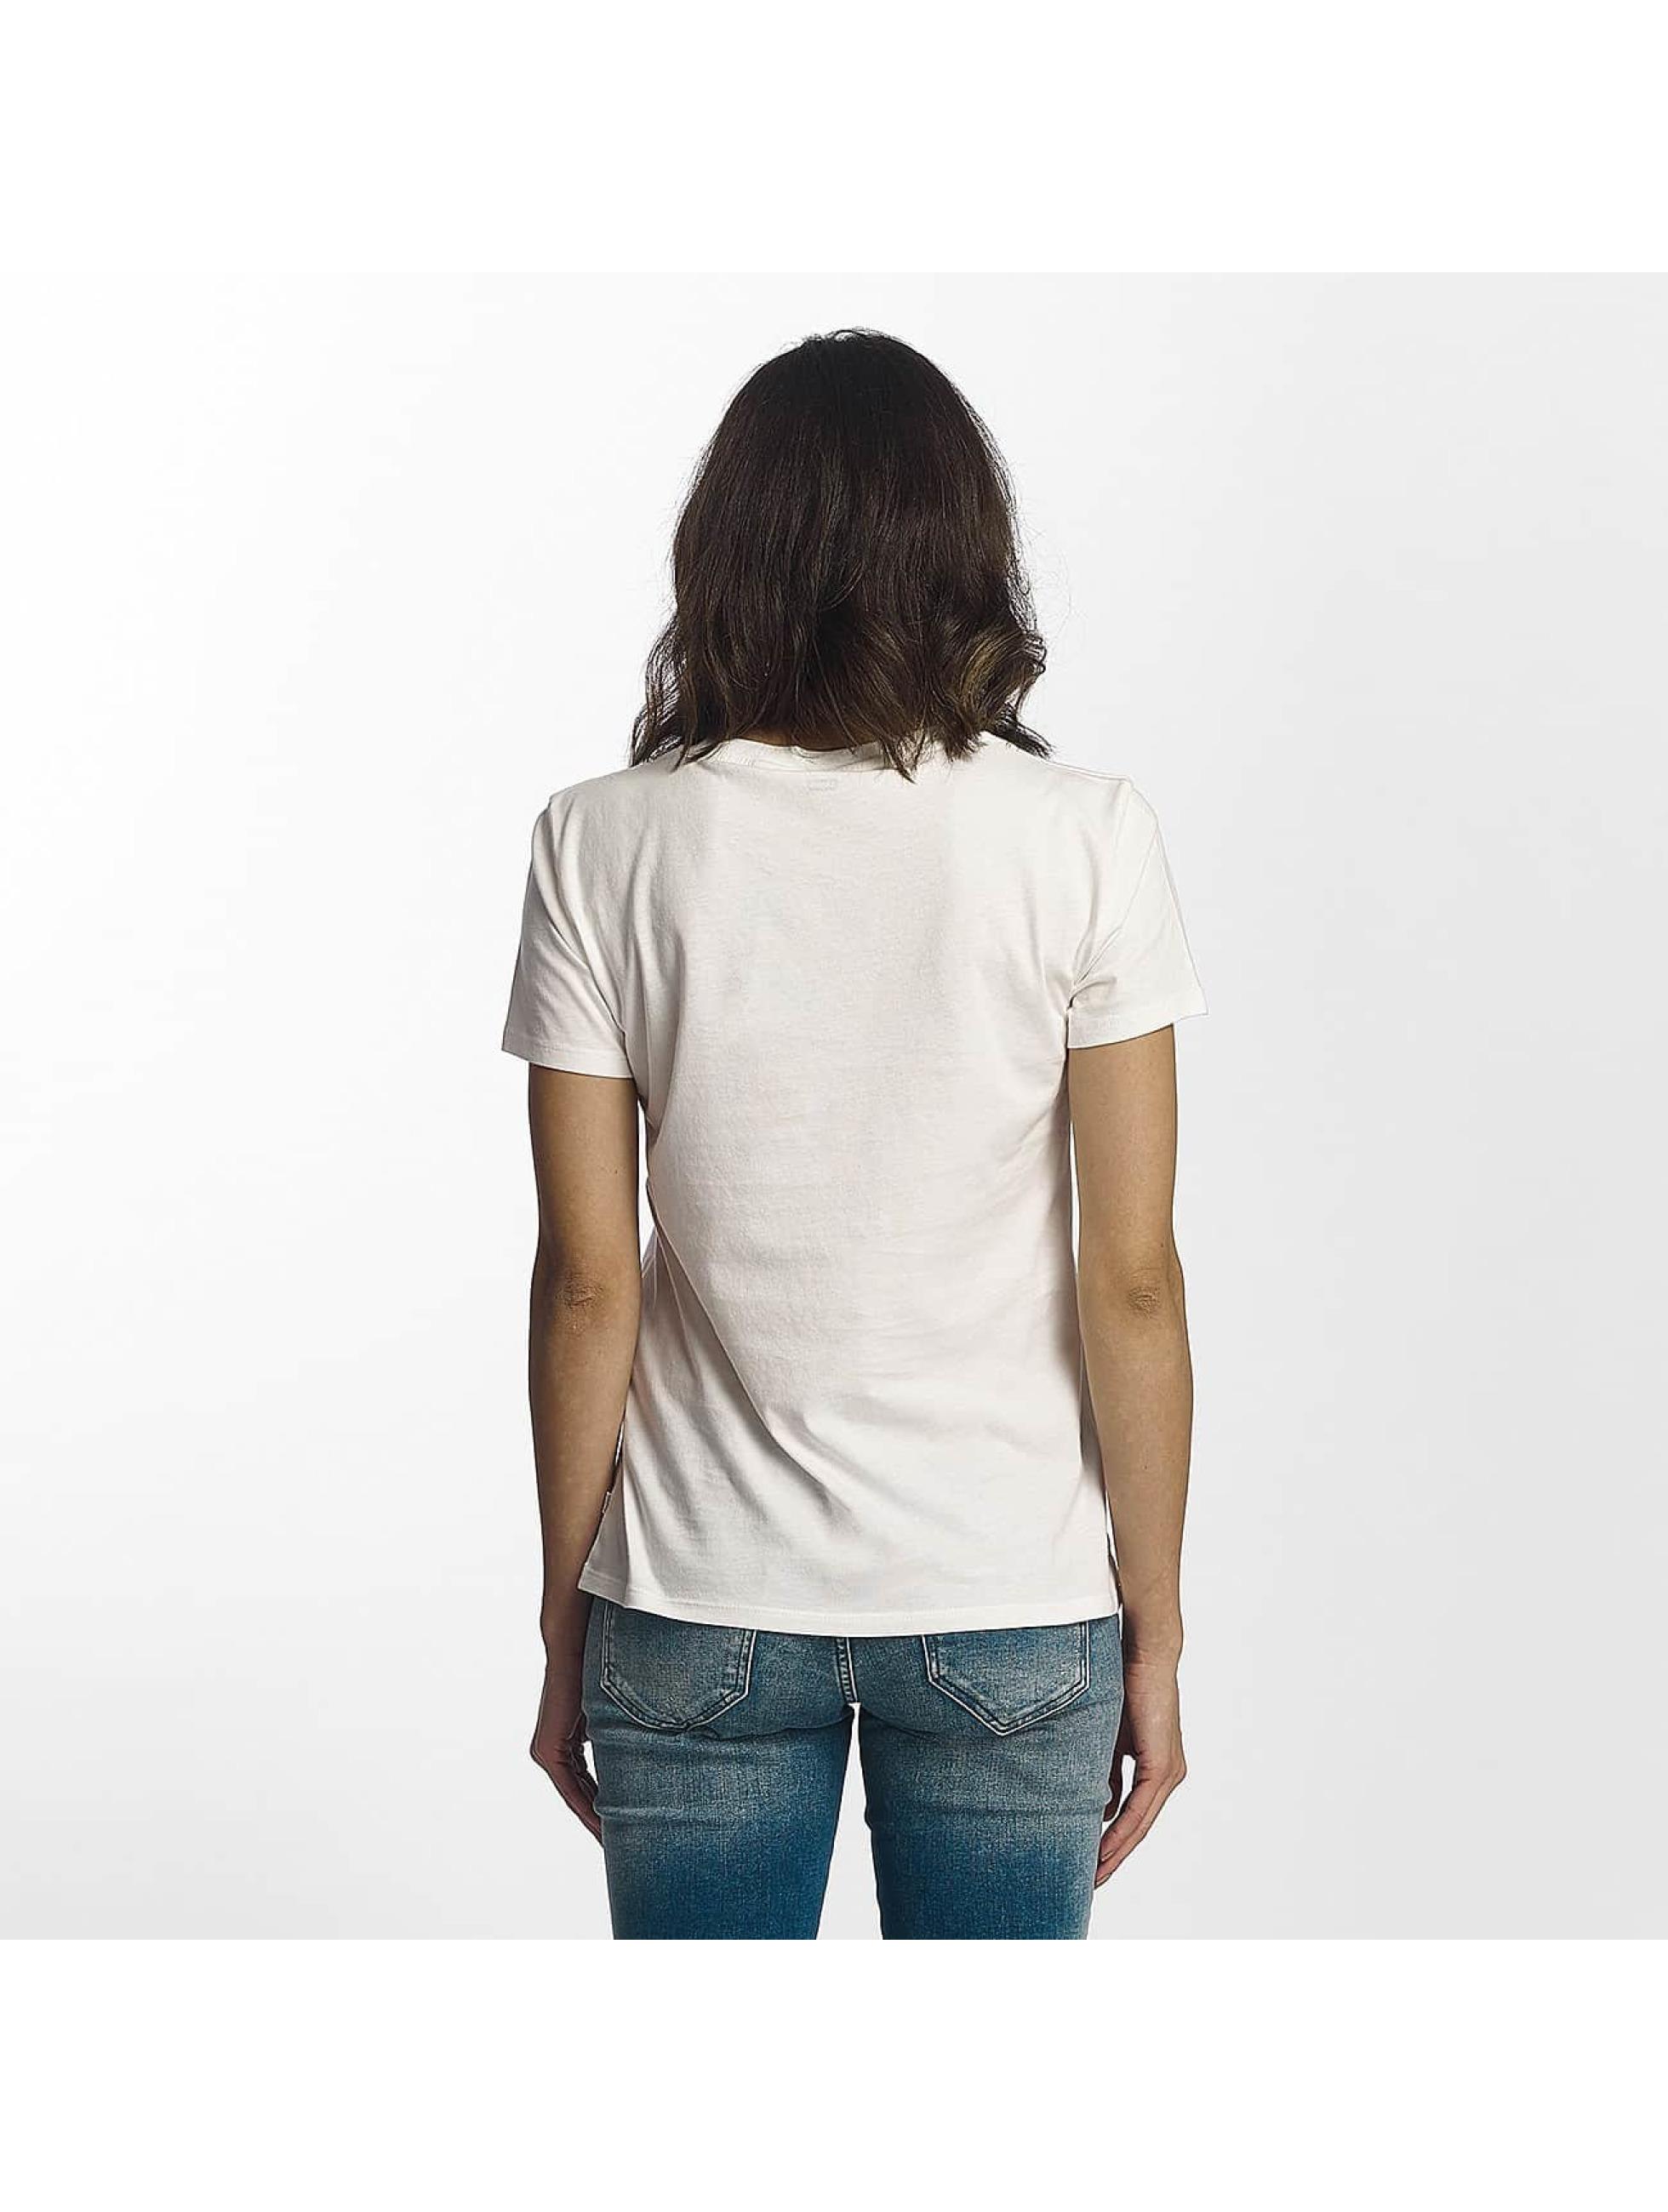 Levi's® T-Shirt Retro 501 weiß